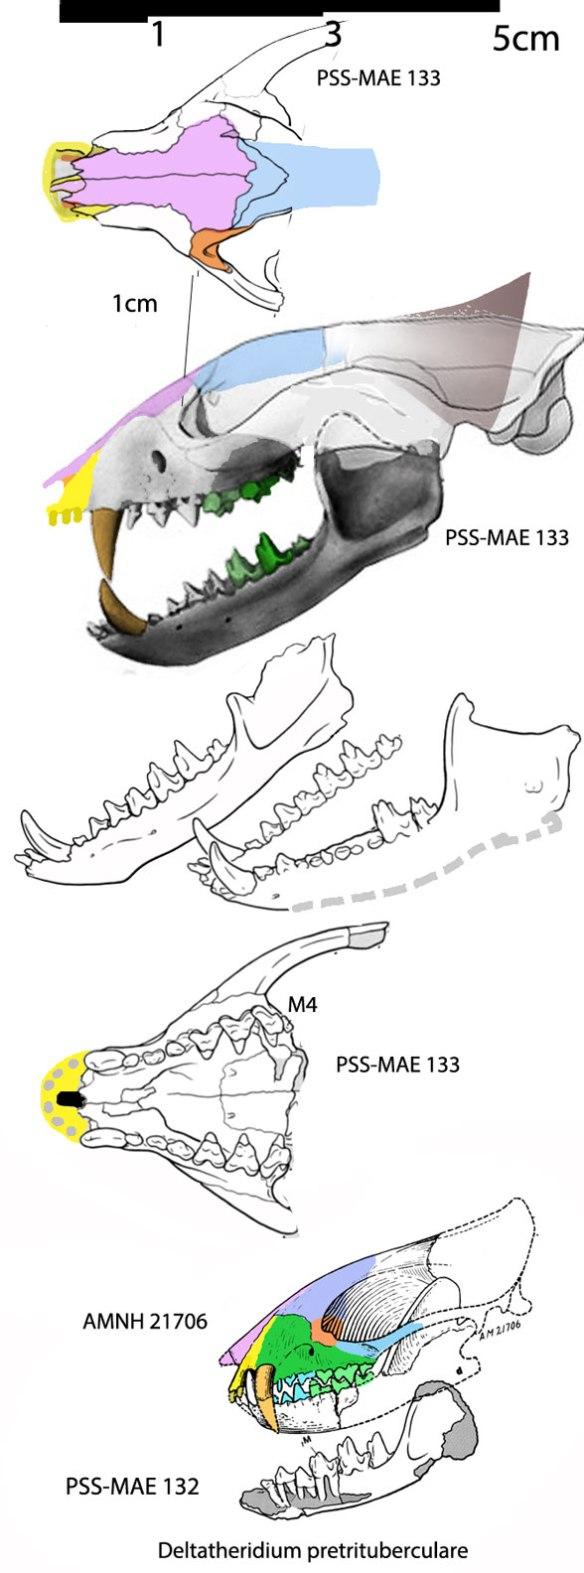 Figure 1. Deltatheridium skulls, PSS-MAE 132, 133 and AMNH 21706.